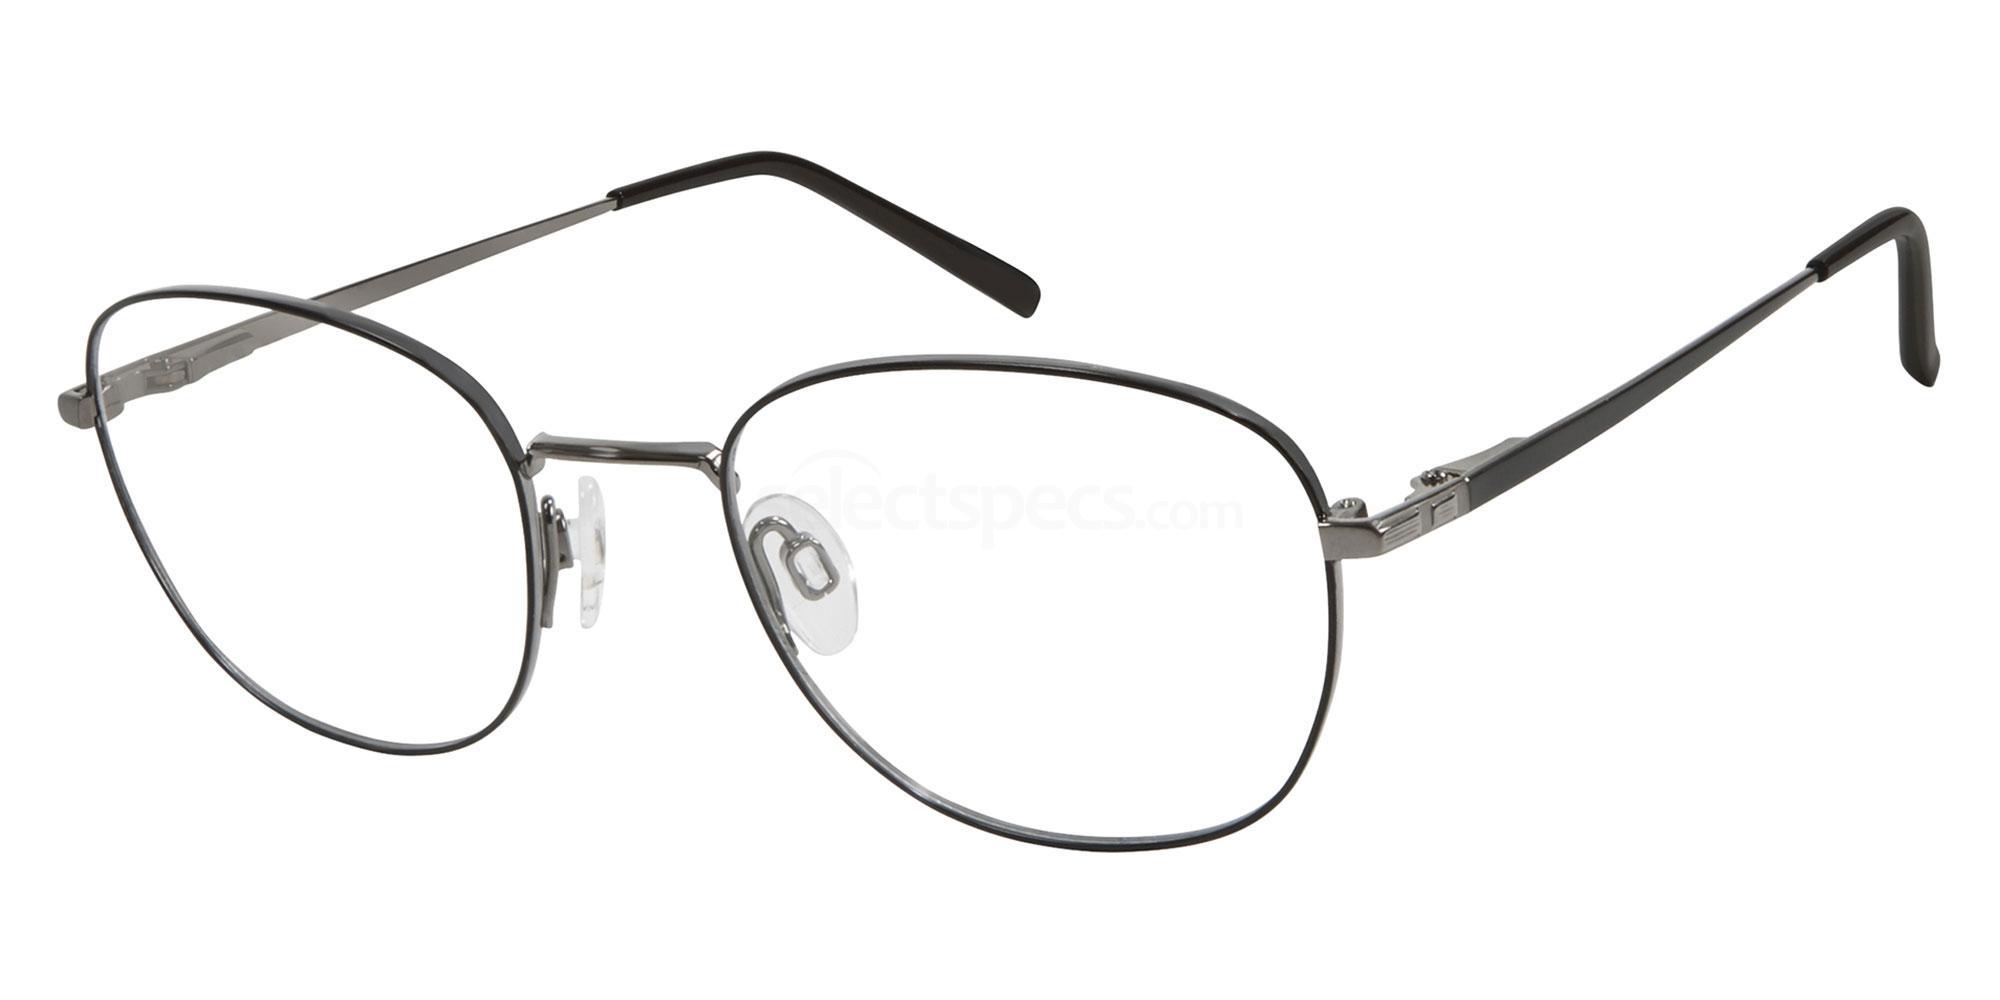 BK CH11442 Glasses, Charmant Titanium Perfection